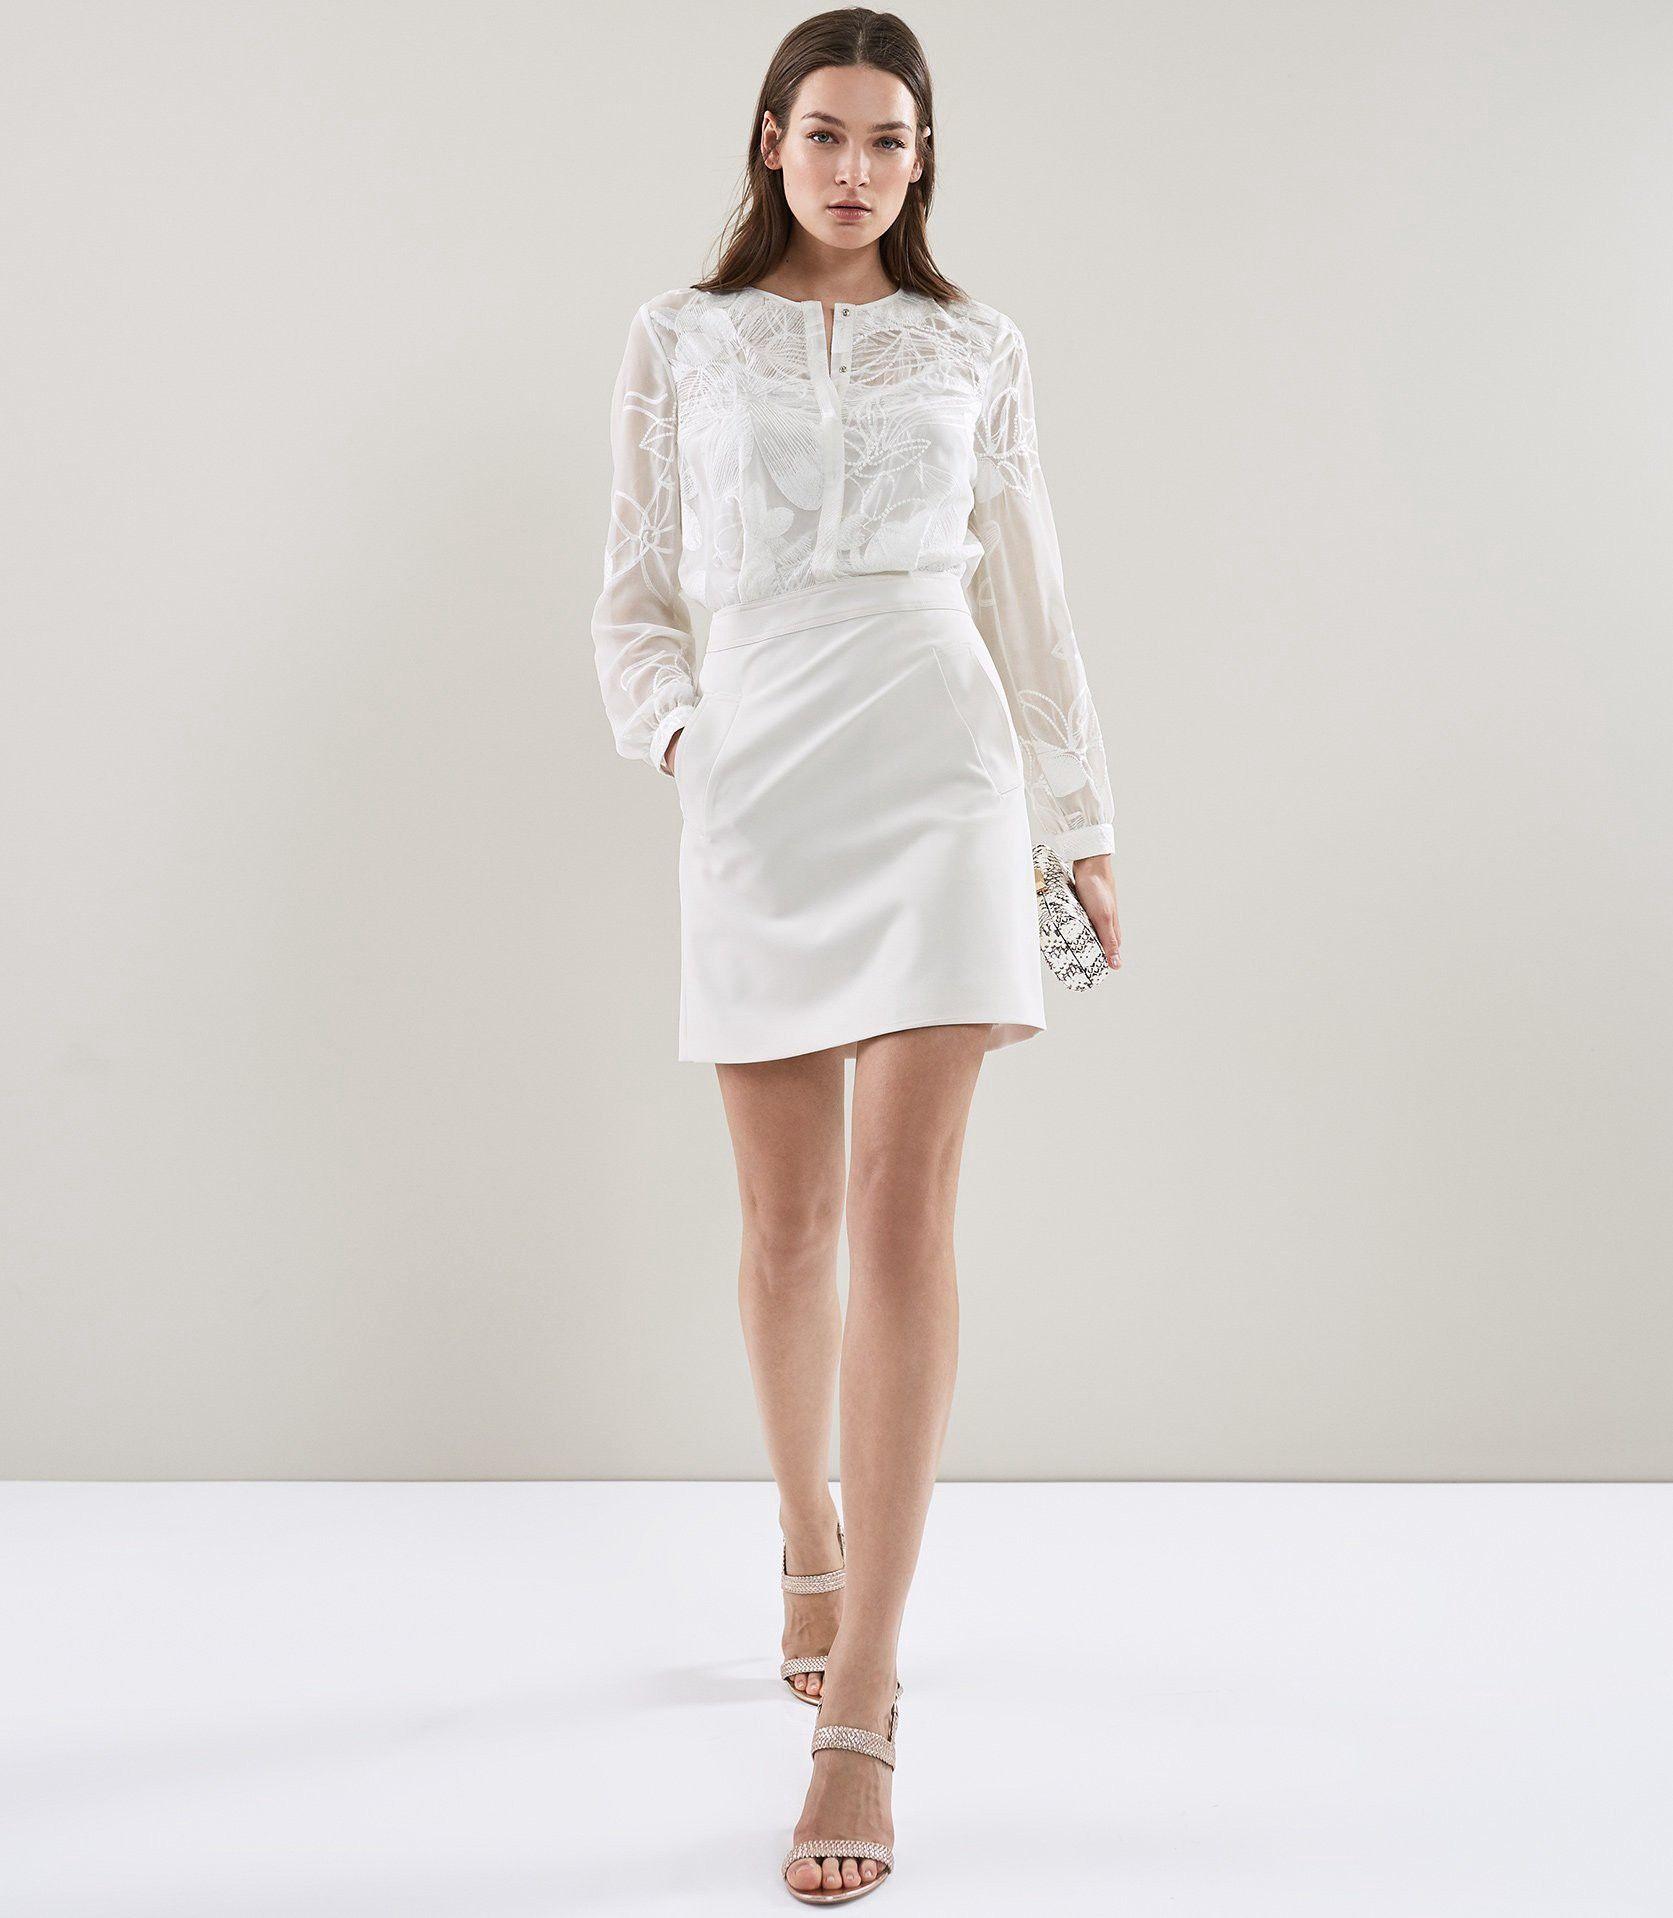 29c9b4d0339 Reiss Rosemary Lace Pocket Dress White - 10